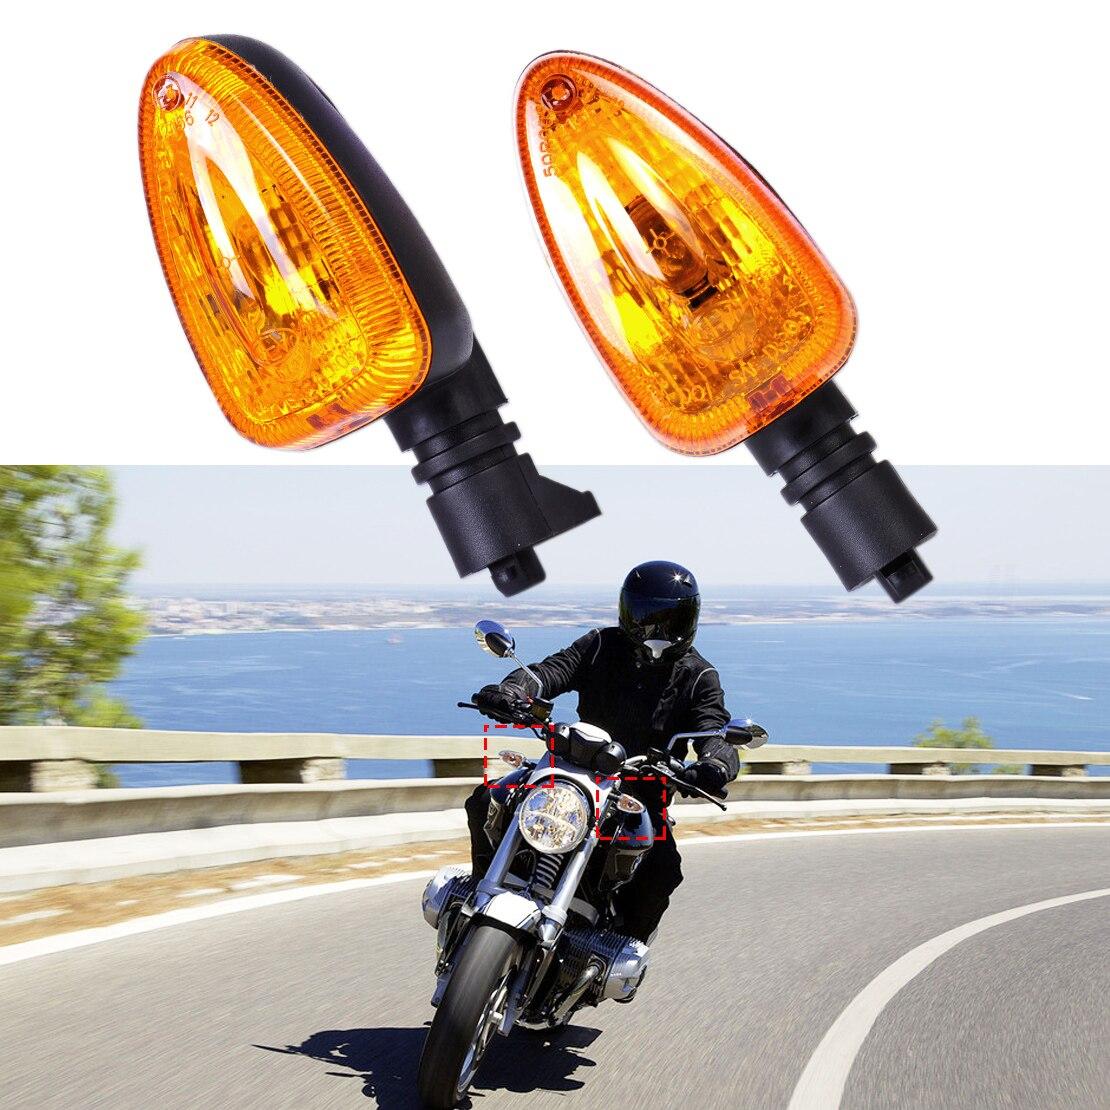 Motorcycle 1 Pair Yellow Turn Signal Indicator Light Lamp Fit for BMW F650GS F800S F800ST R1200R R1200GS G450X K1300S K1200R